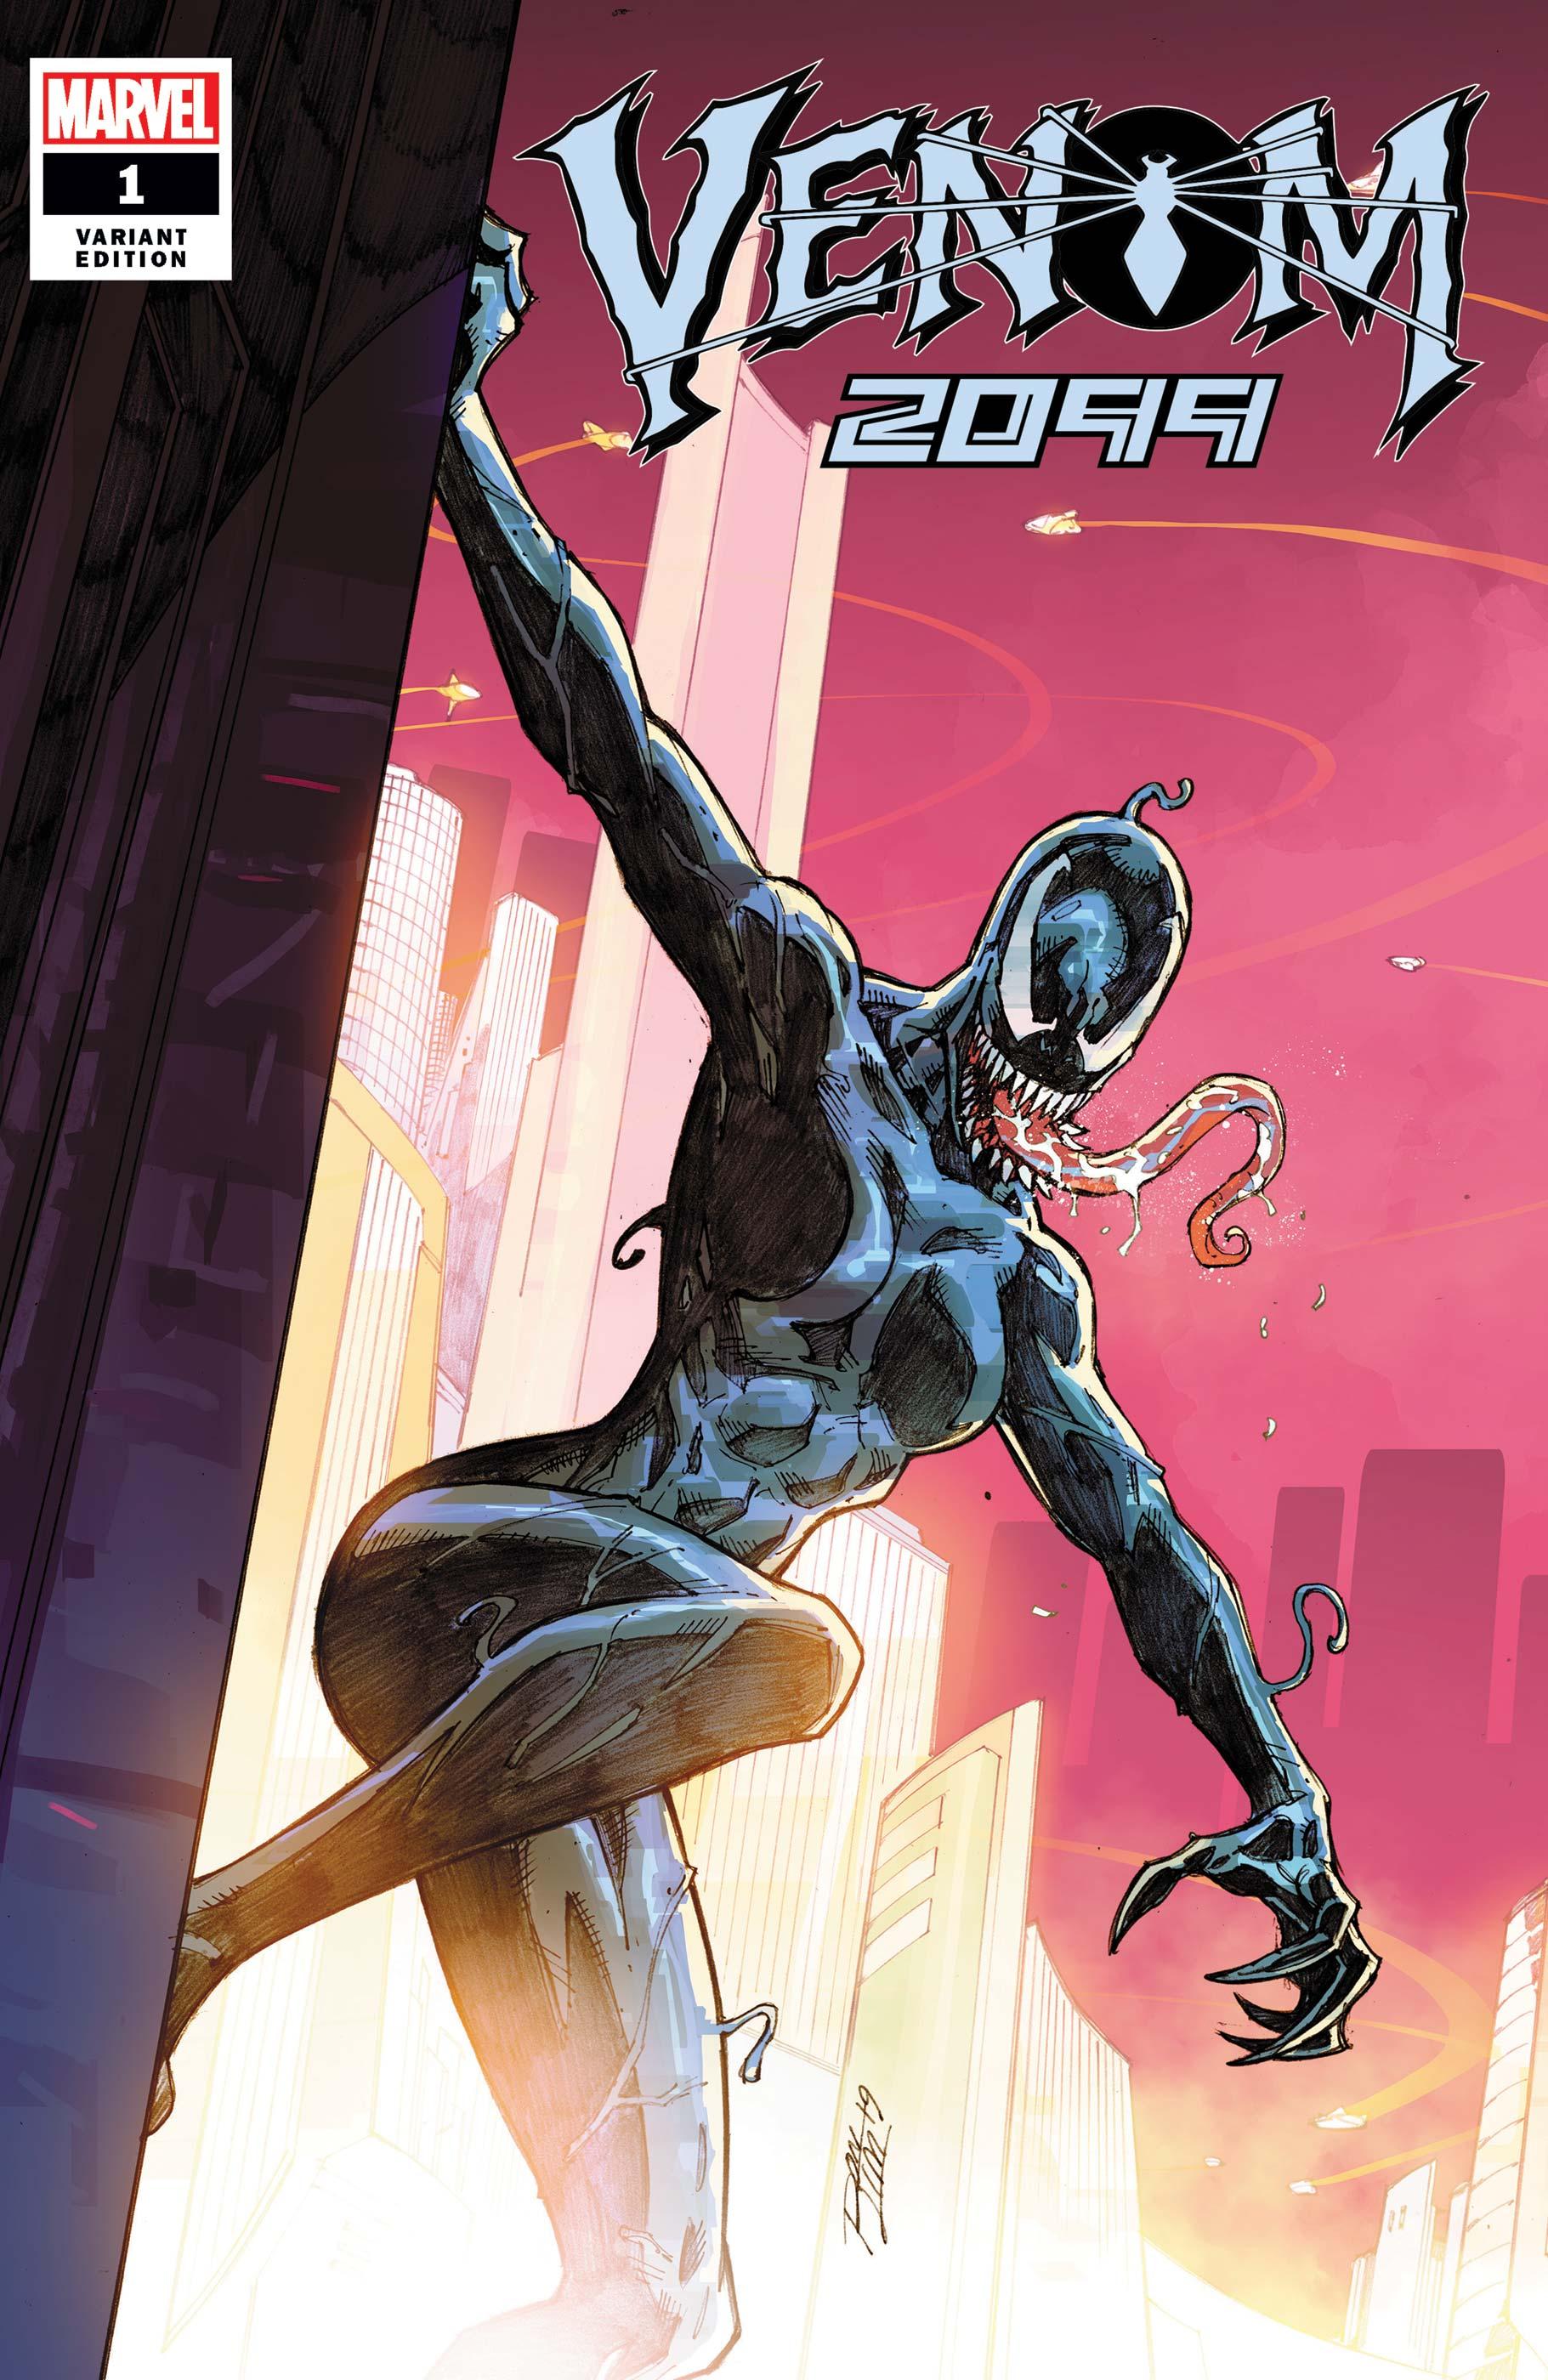 Venom 2099 (2019) #1 (Variant)